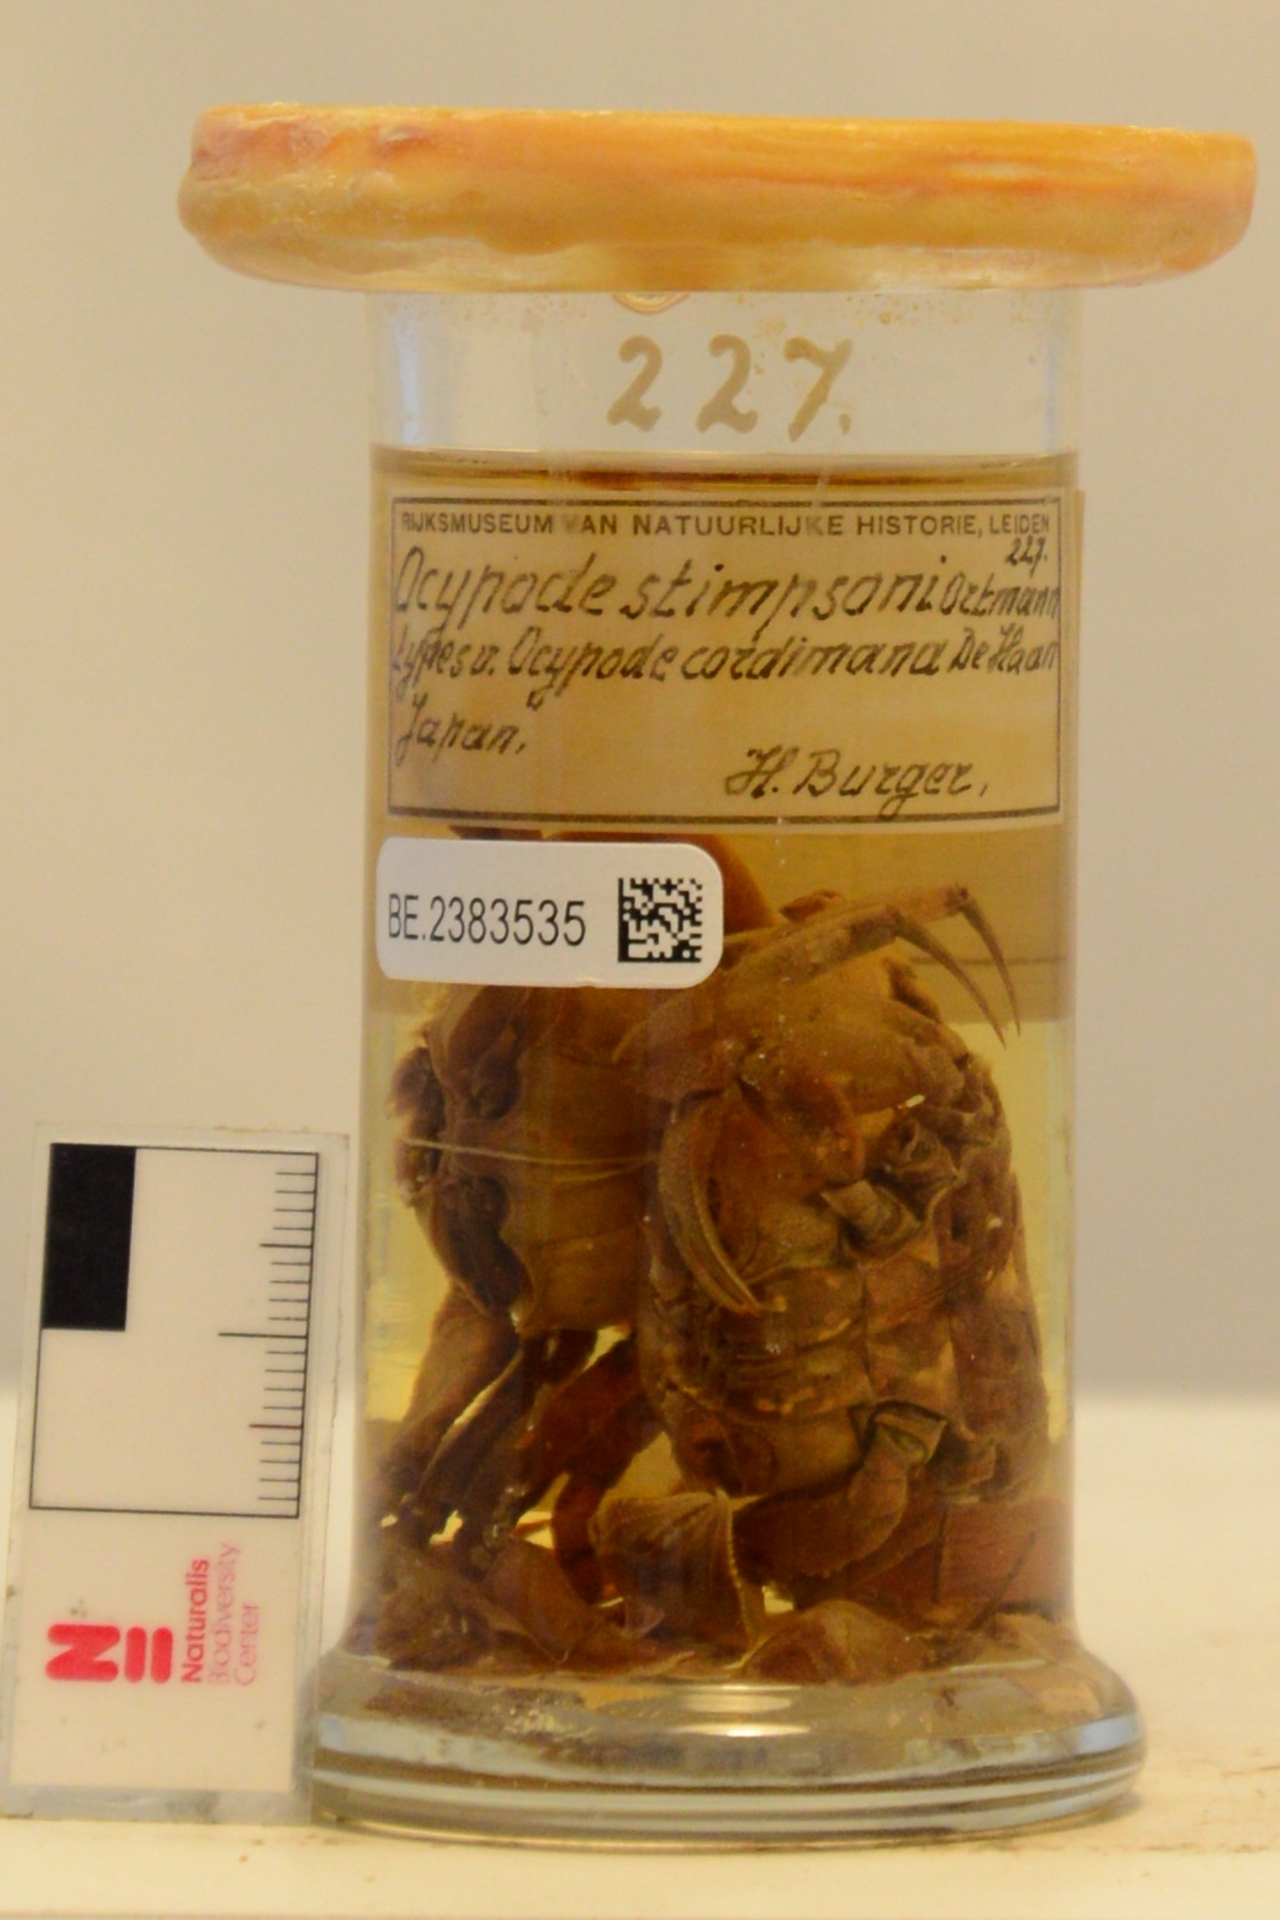 RMNH.CRUS.D.227 | Ocypode stimpsoni Ortmann, 1897